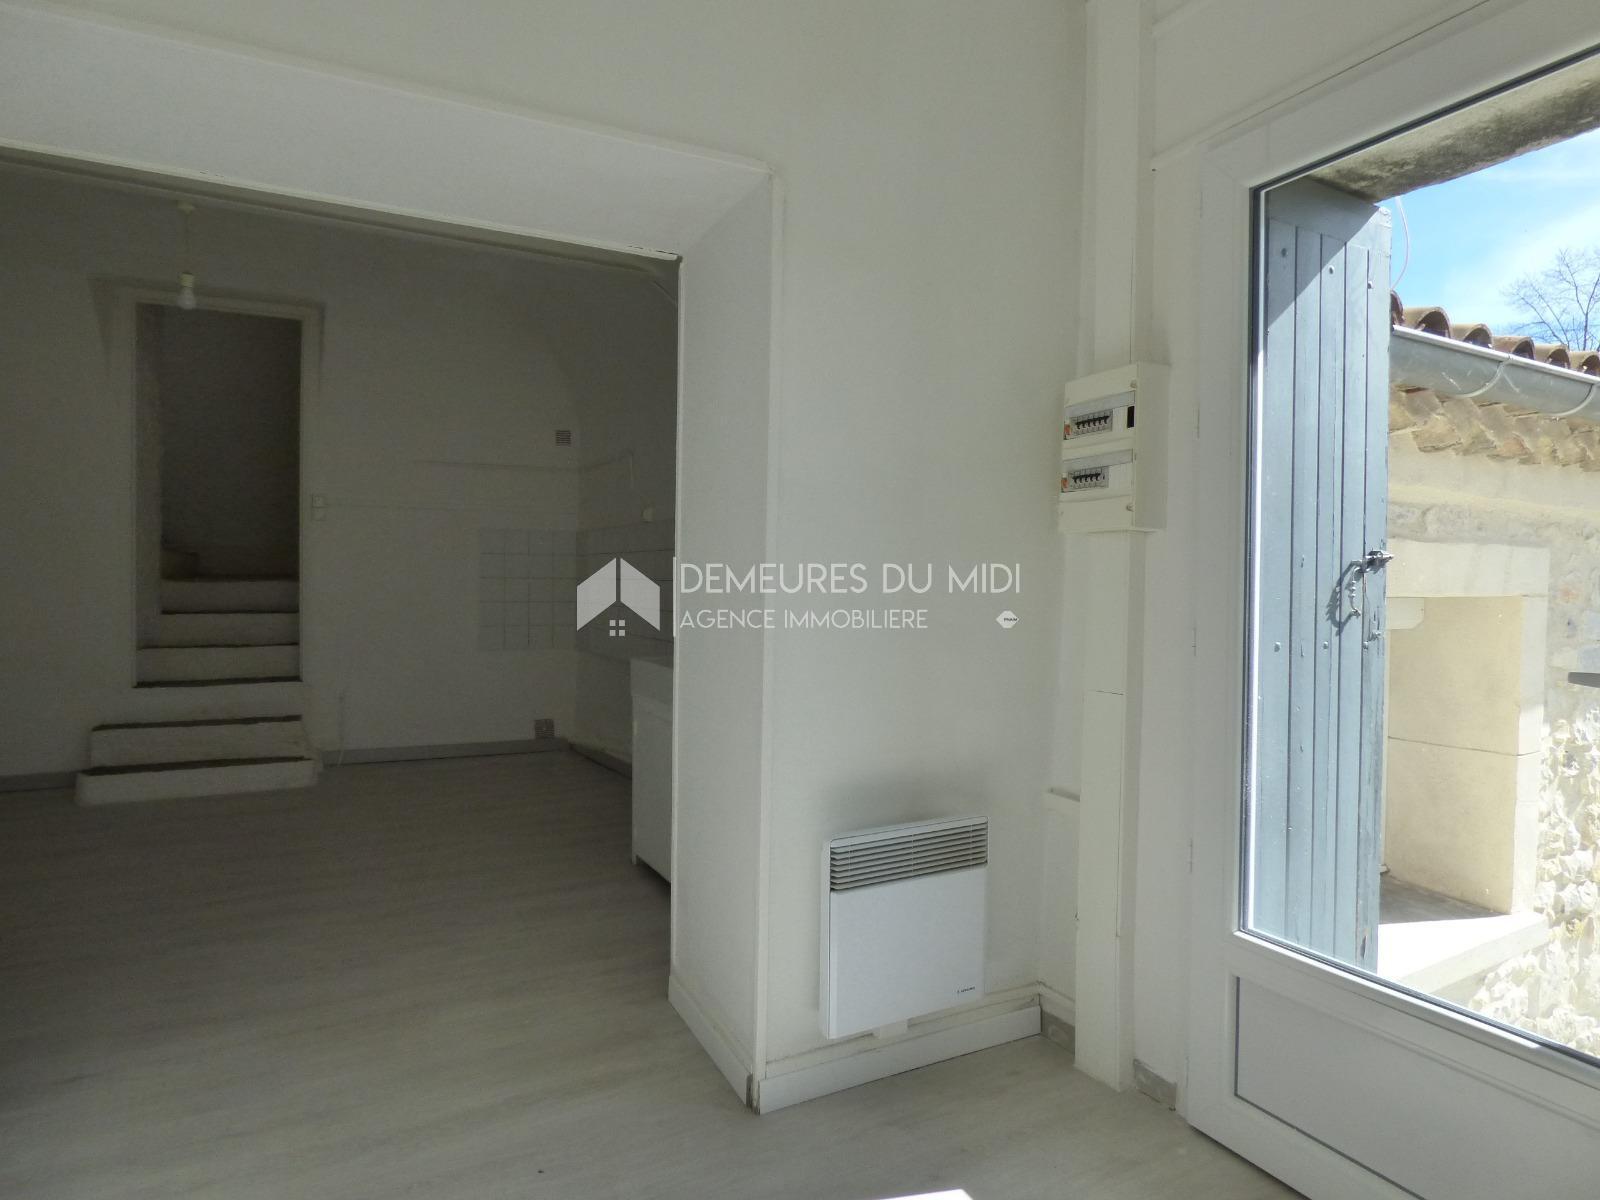 Offres de location Duplex Brouzet-lès-Quissac 30260